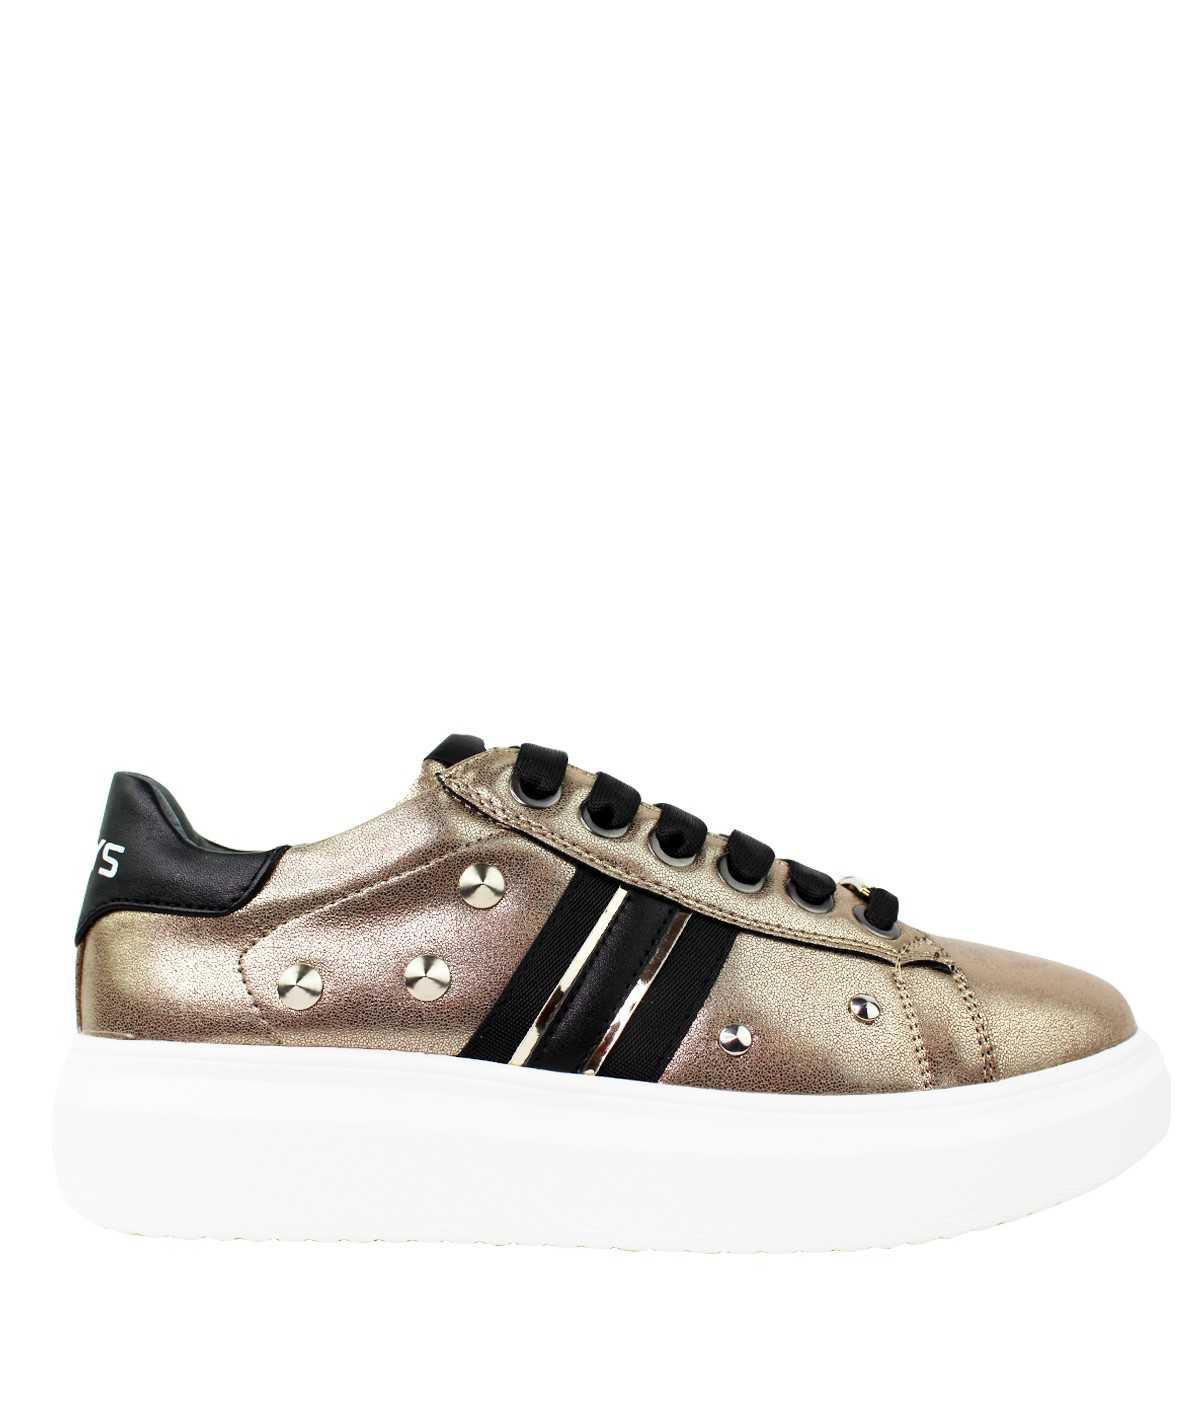 KEYS Sneakers Doonna